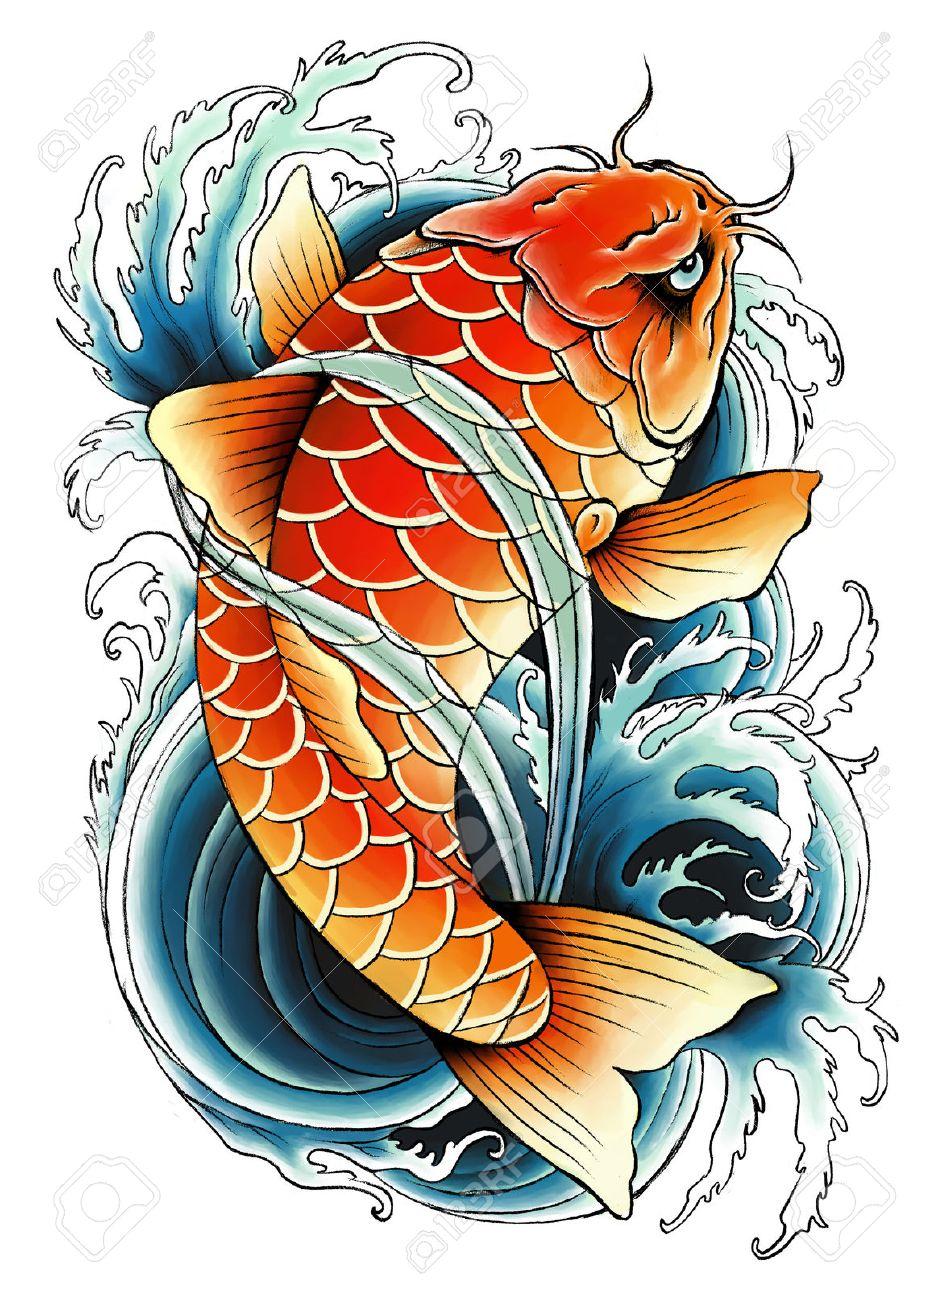 Asian carp painting - 39343706